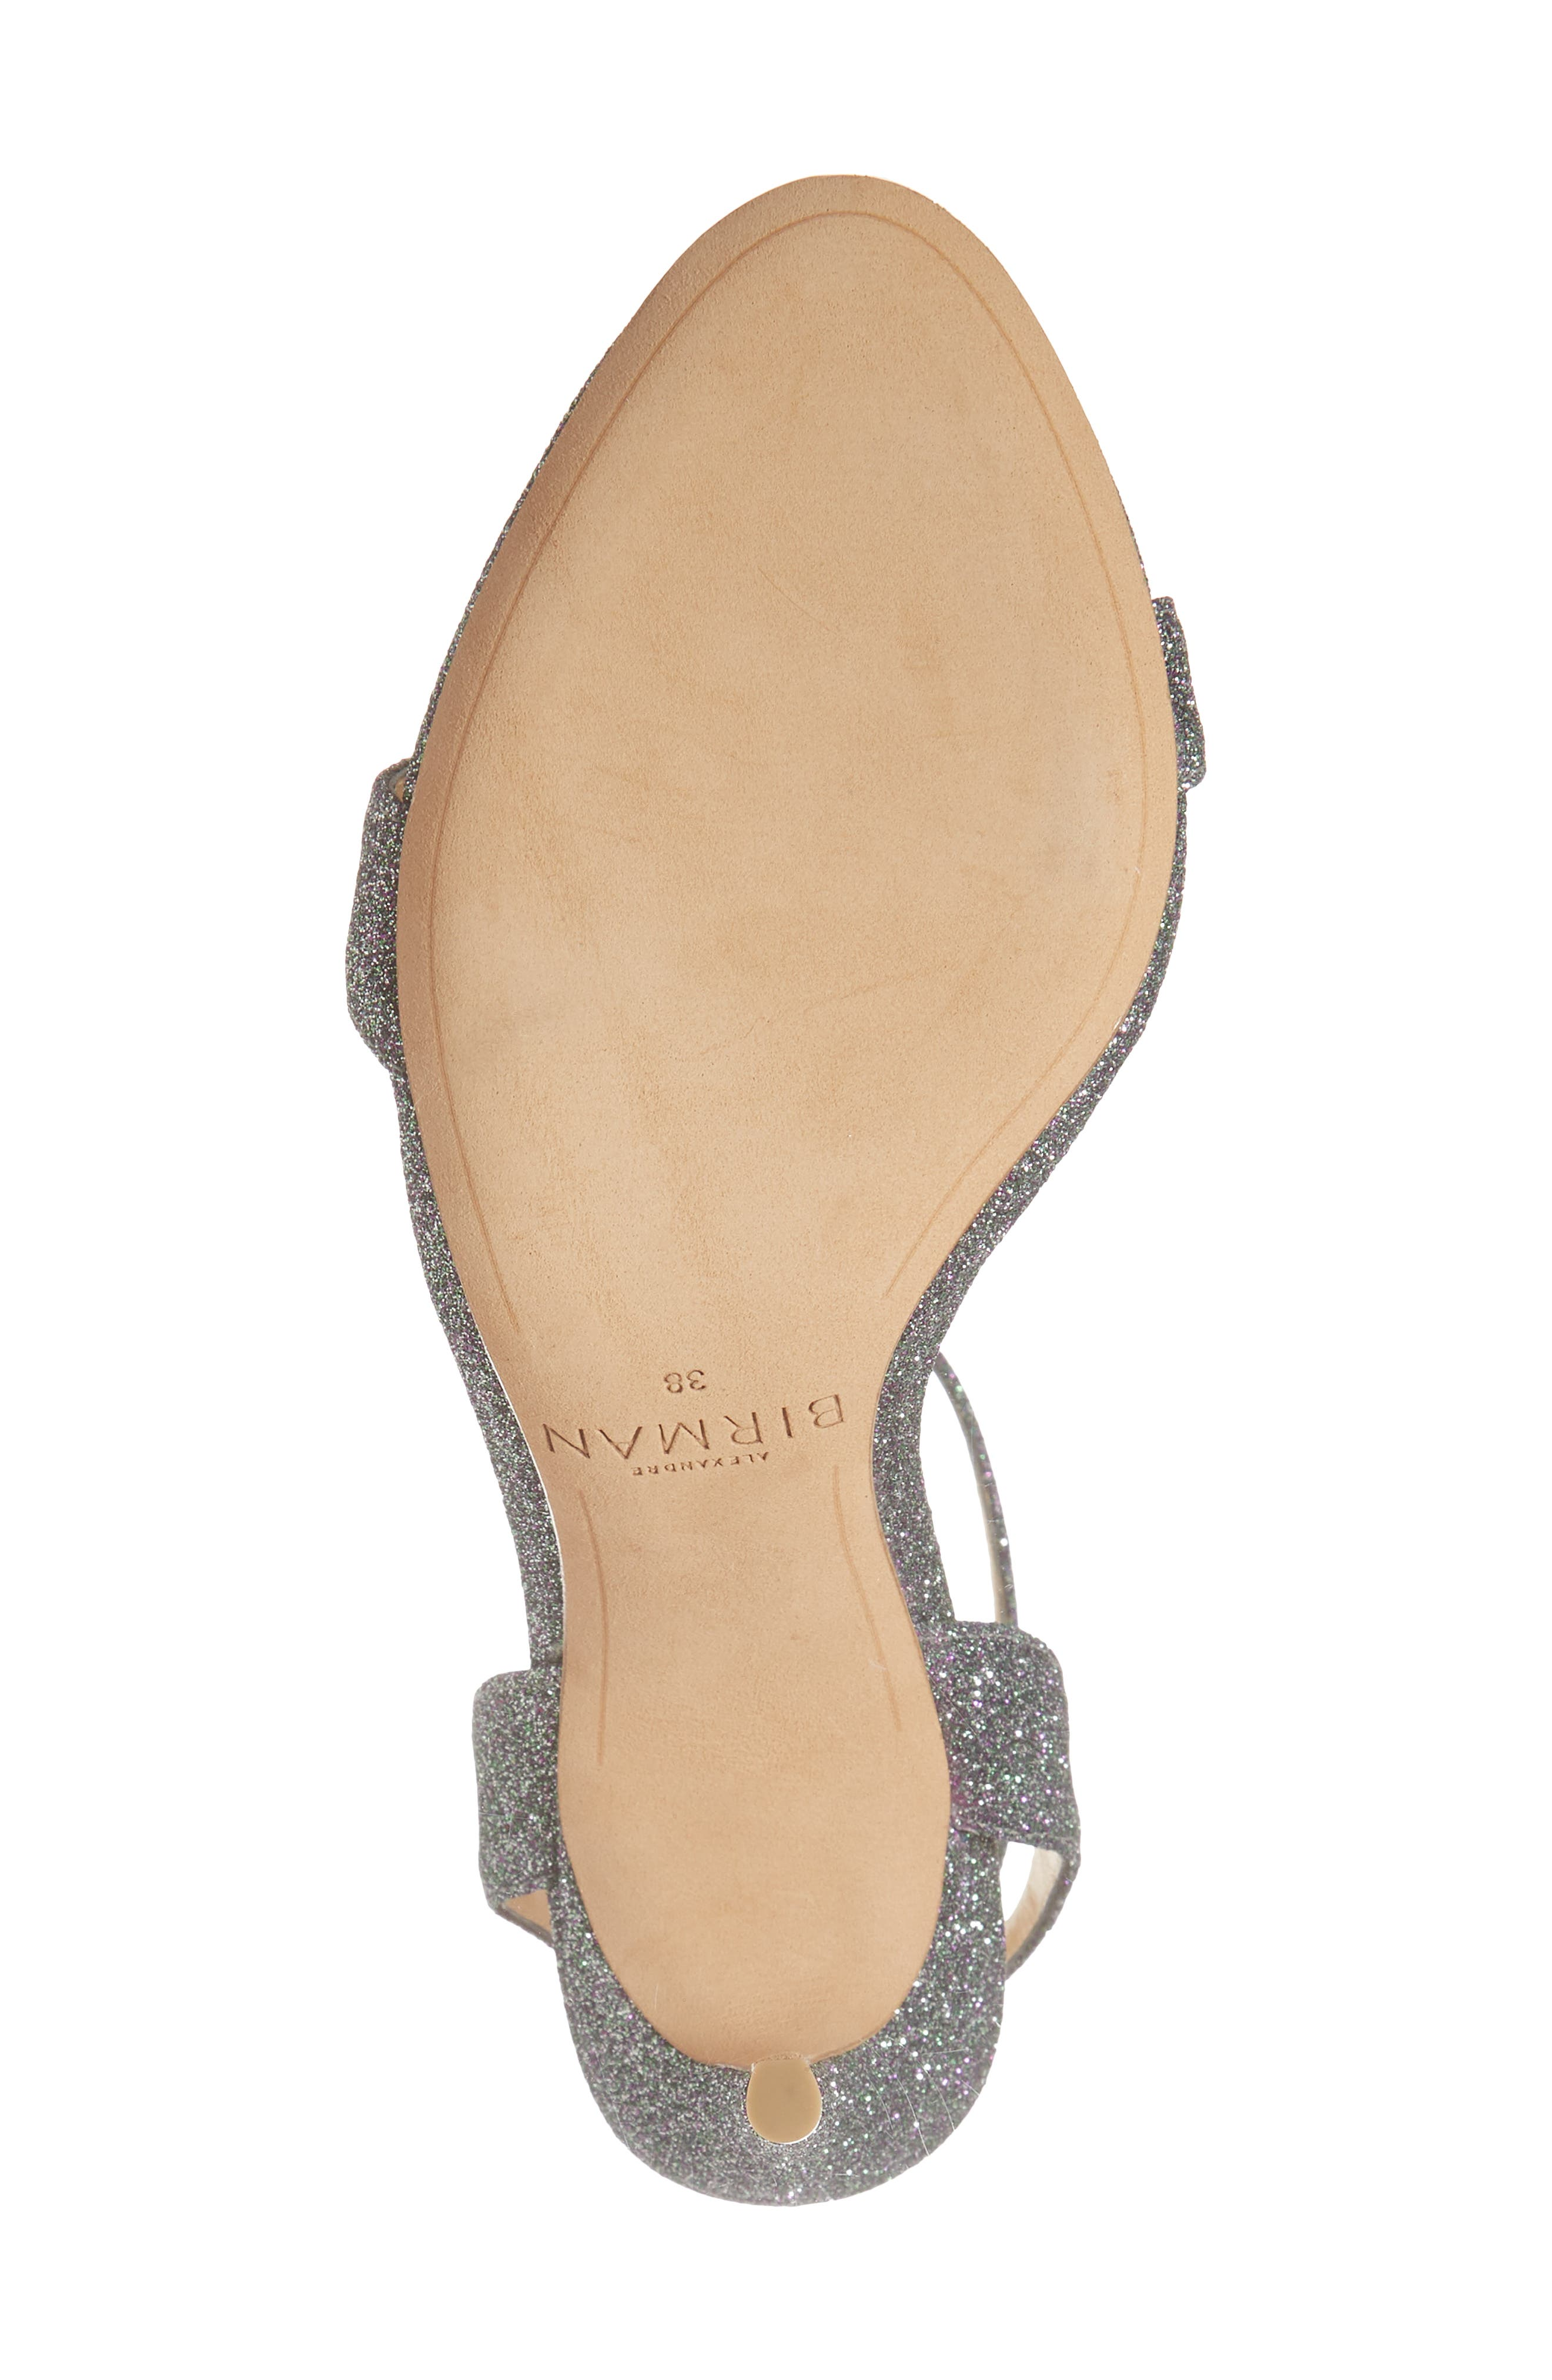 Santine Ankle Strap Sandal,                             Alternate thumbnail 6, color,                             040